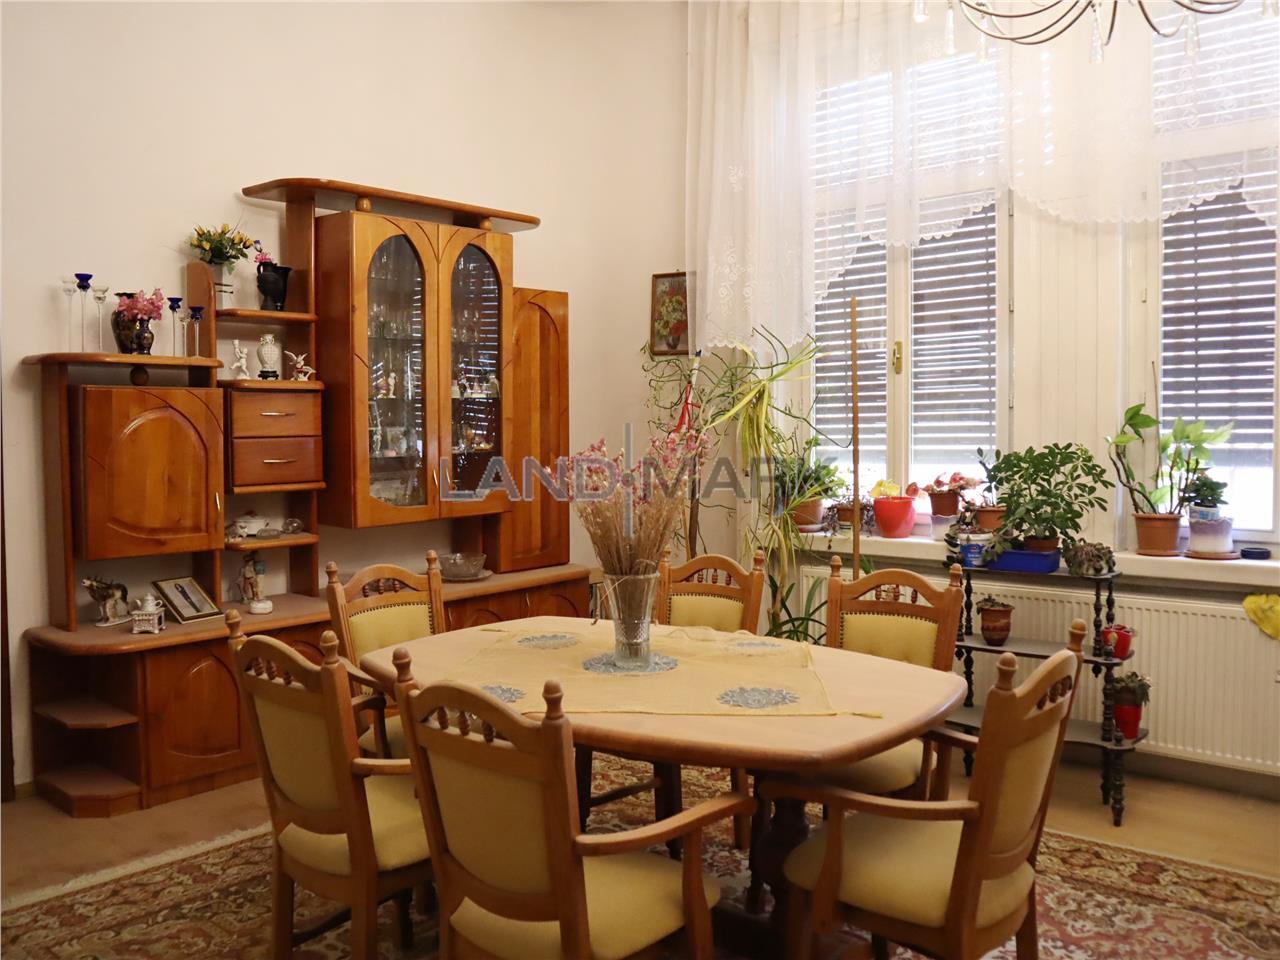 Apartament ultracentral, imobil istoric